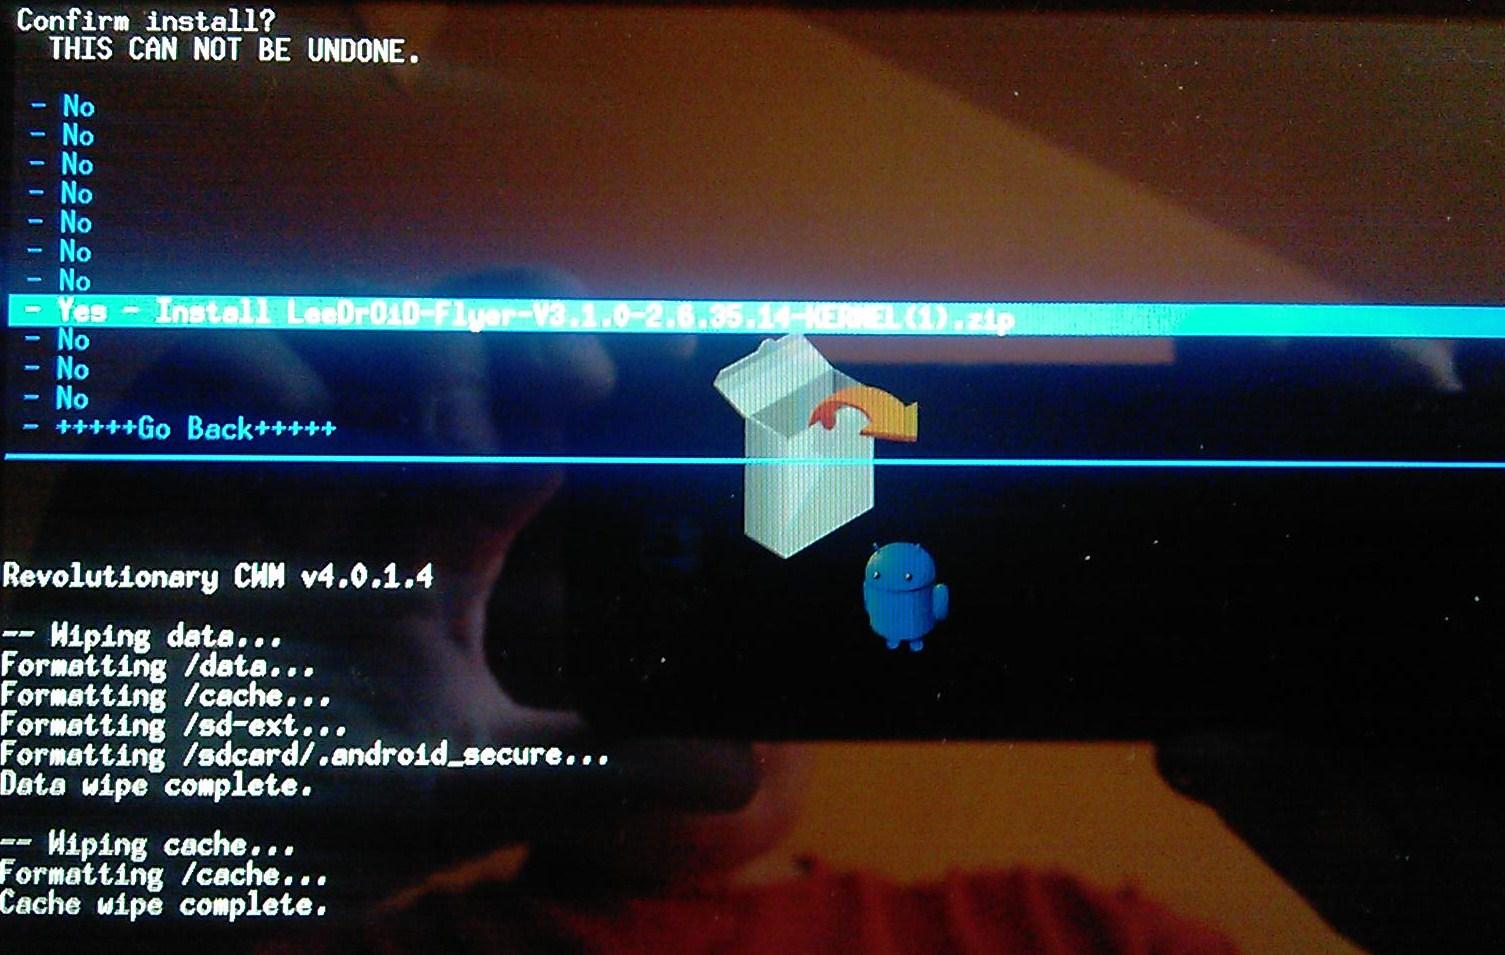 [Tuto] Downgrade vers GB, passage en S.Off, installation Leedroid GB 2.2.0 (en images) 651360IMAG0010